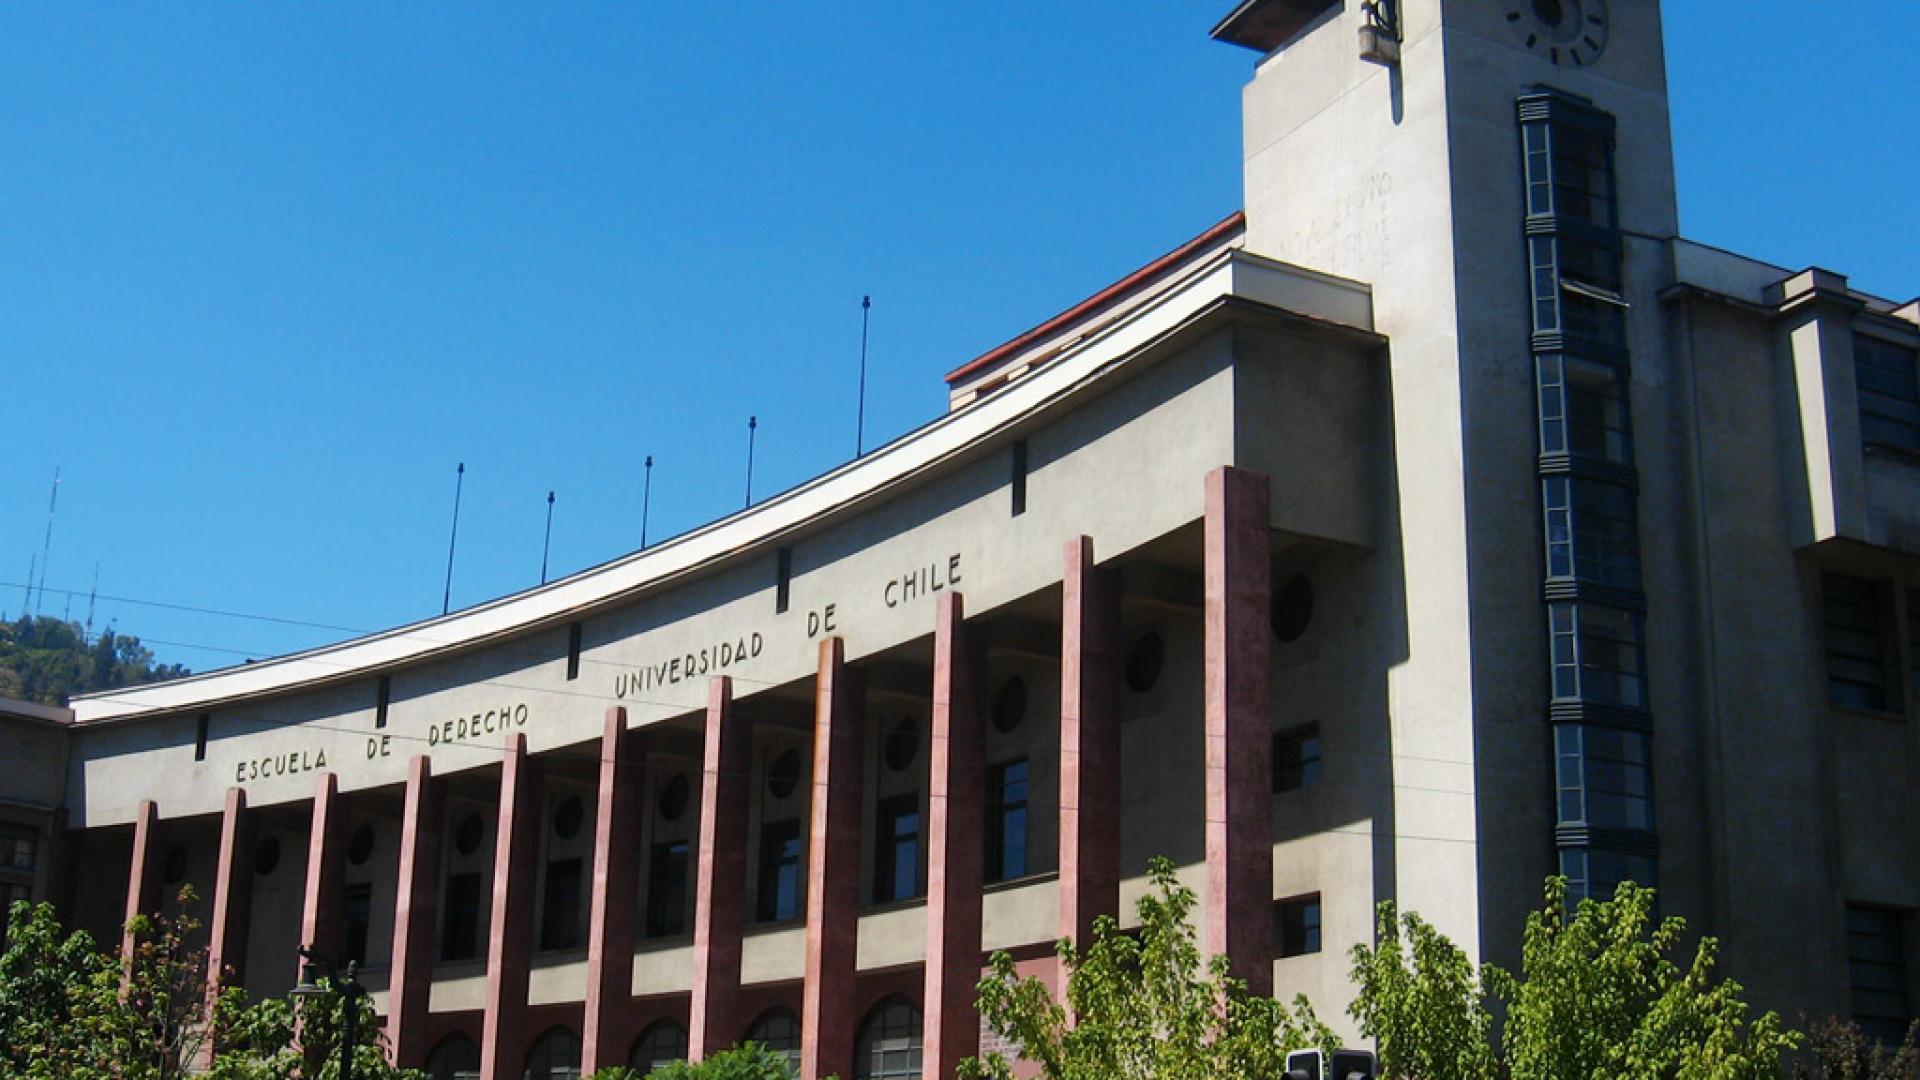 Imagen de Obra del arquitecto Juan Martínez Gutiérrez es declarada Monumento Nacional